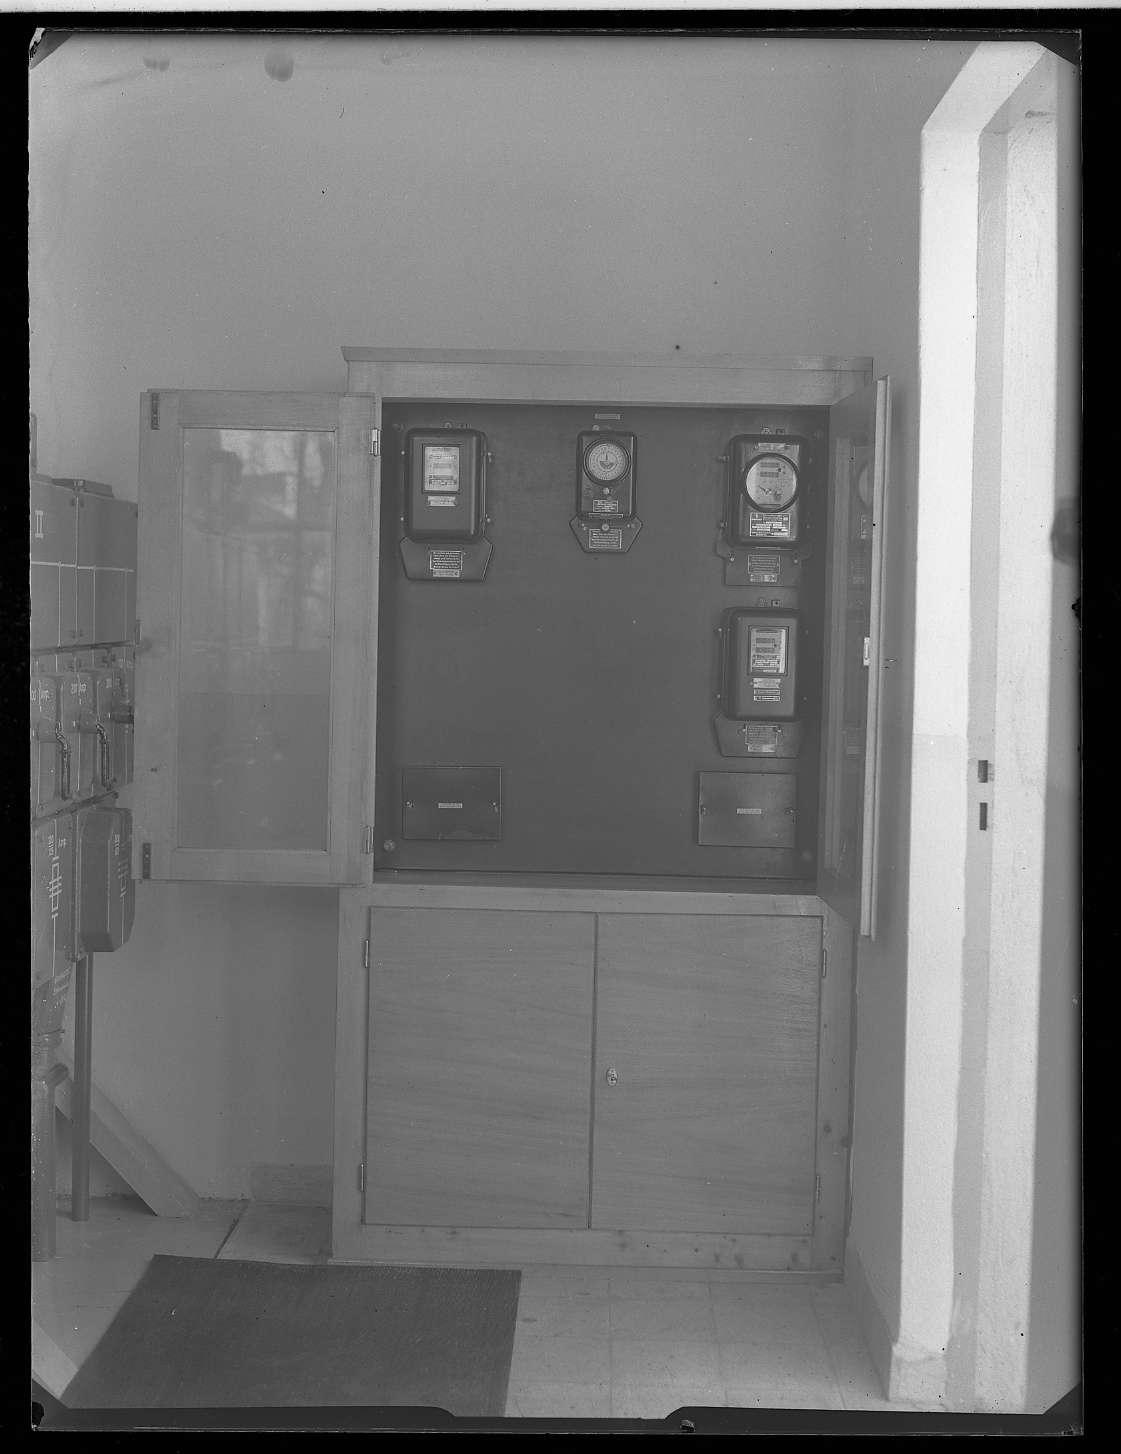 Bietigheim (Württ.), Bf, Umspannstation, Abb. b